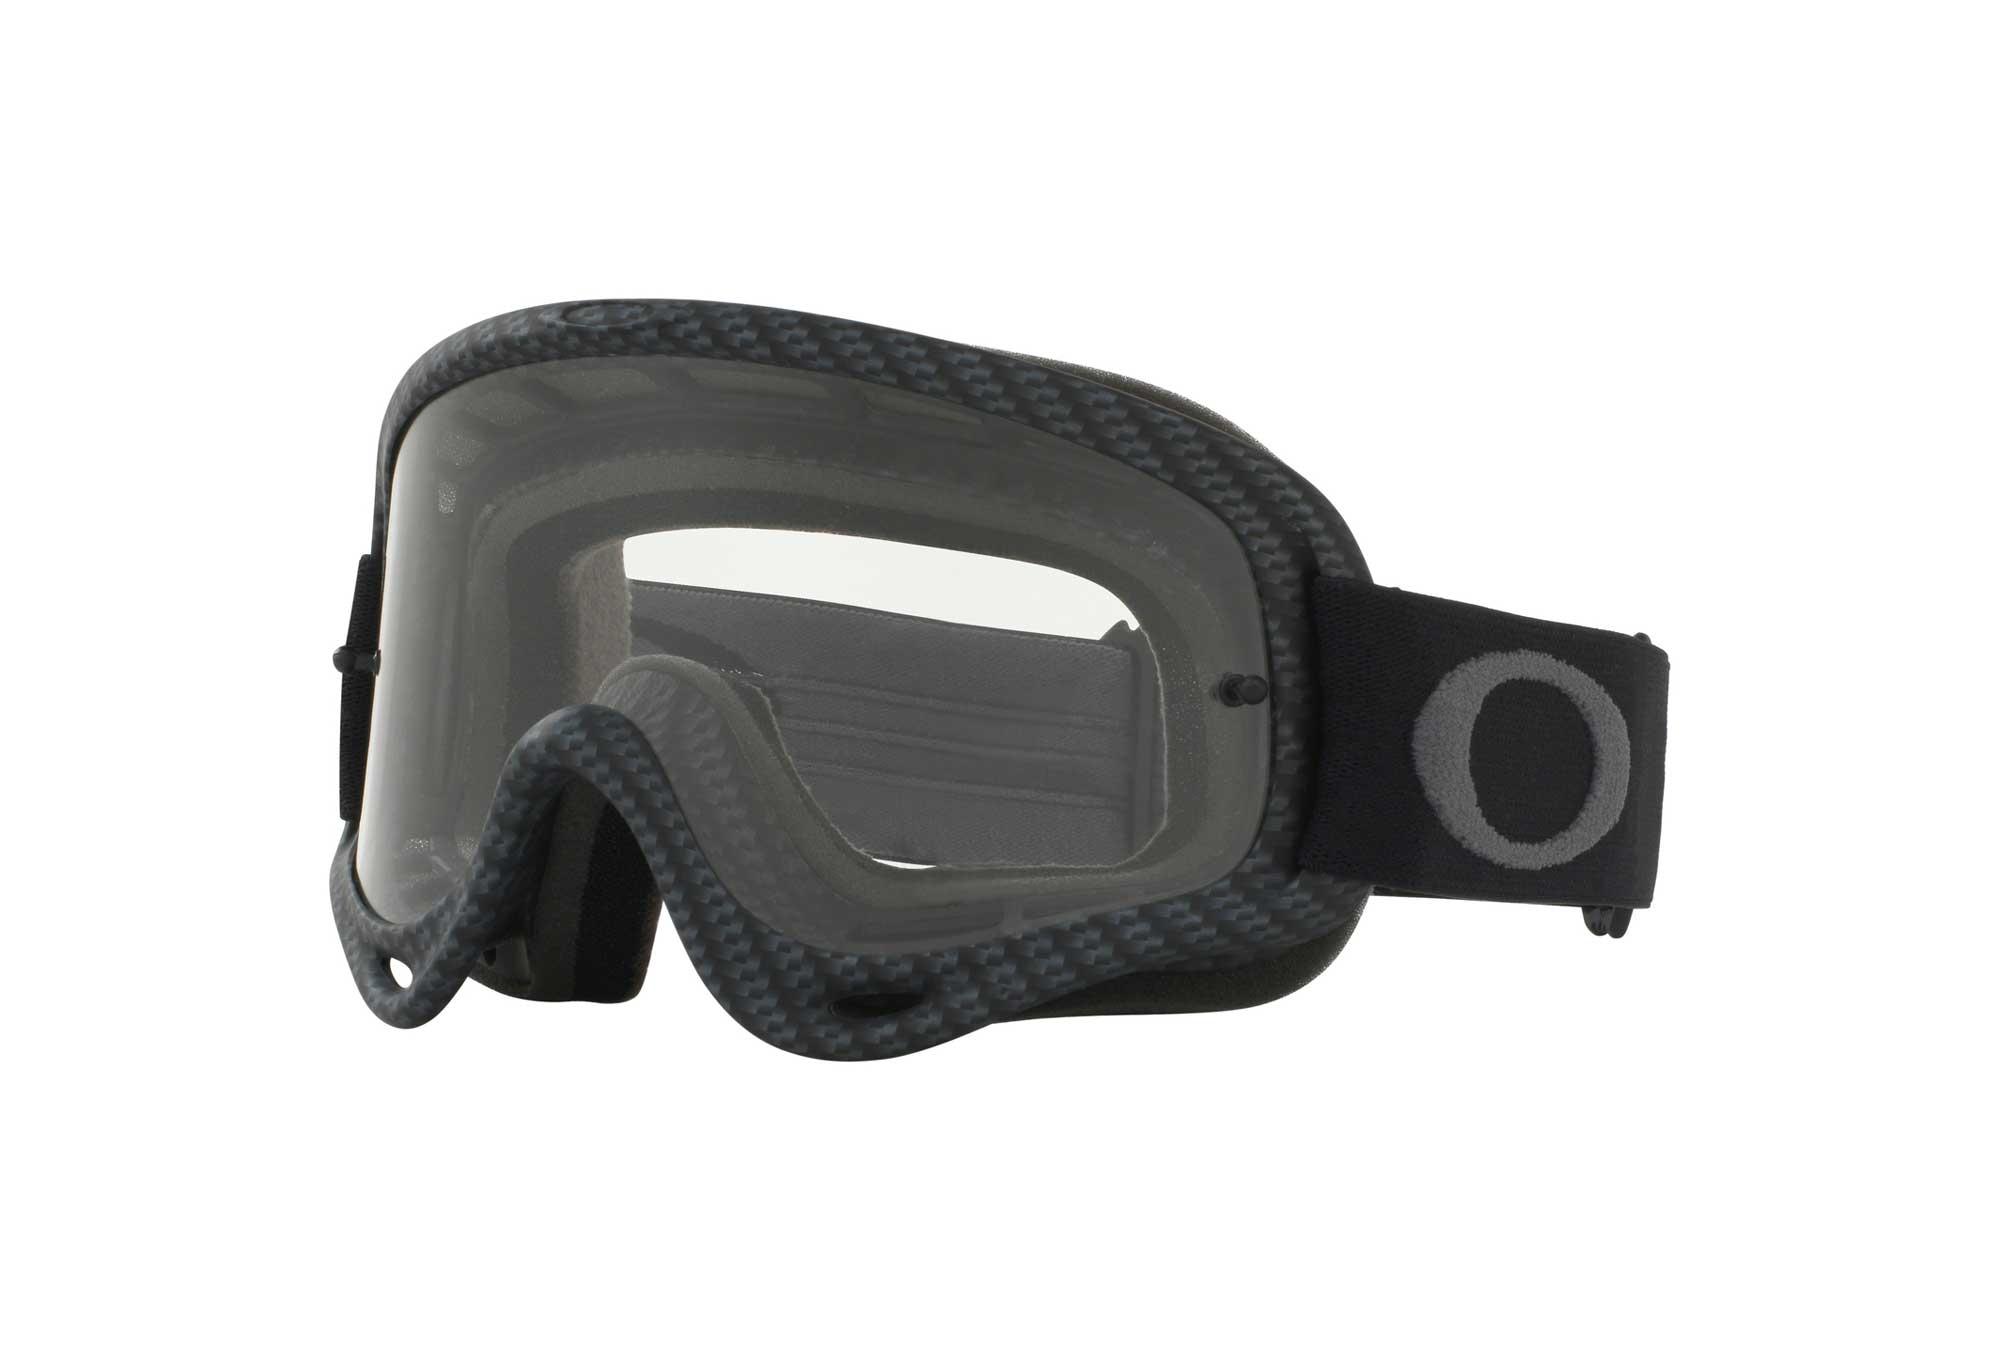 Masque Oakley O-Frame MX Carbon Fiber   Clear   Ref. OO7029-55 ... 87a1353927b7